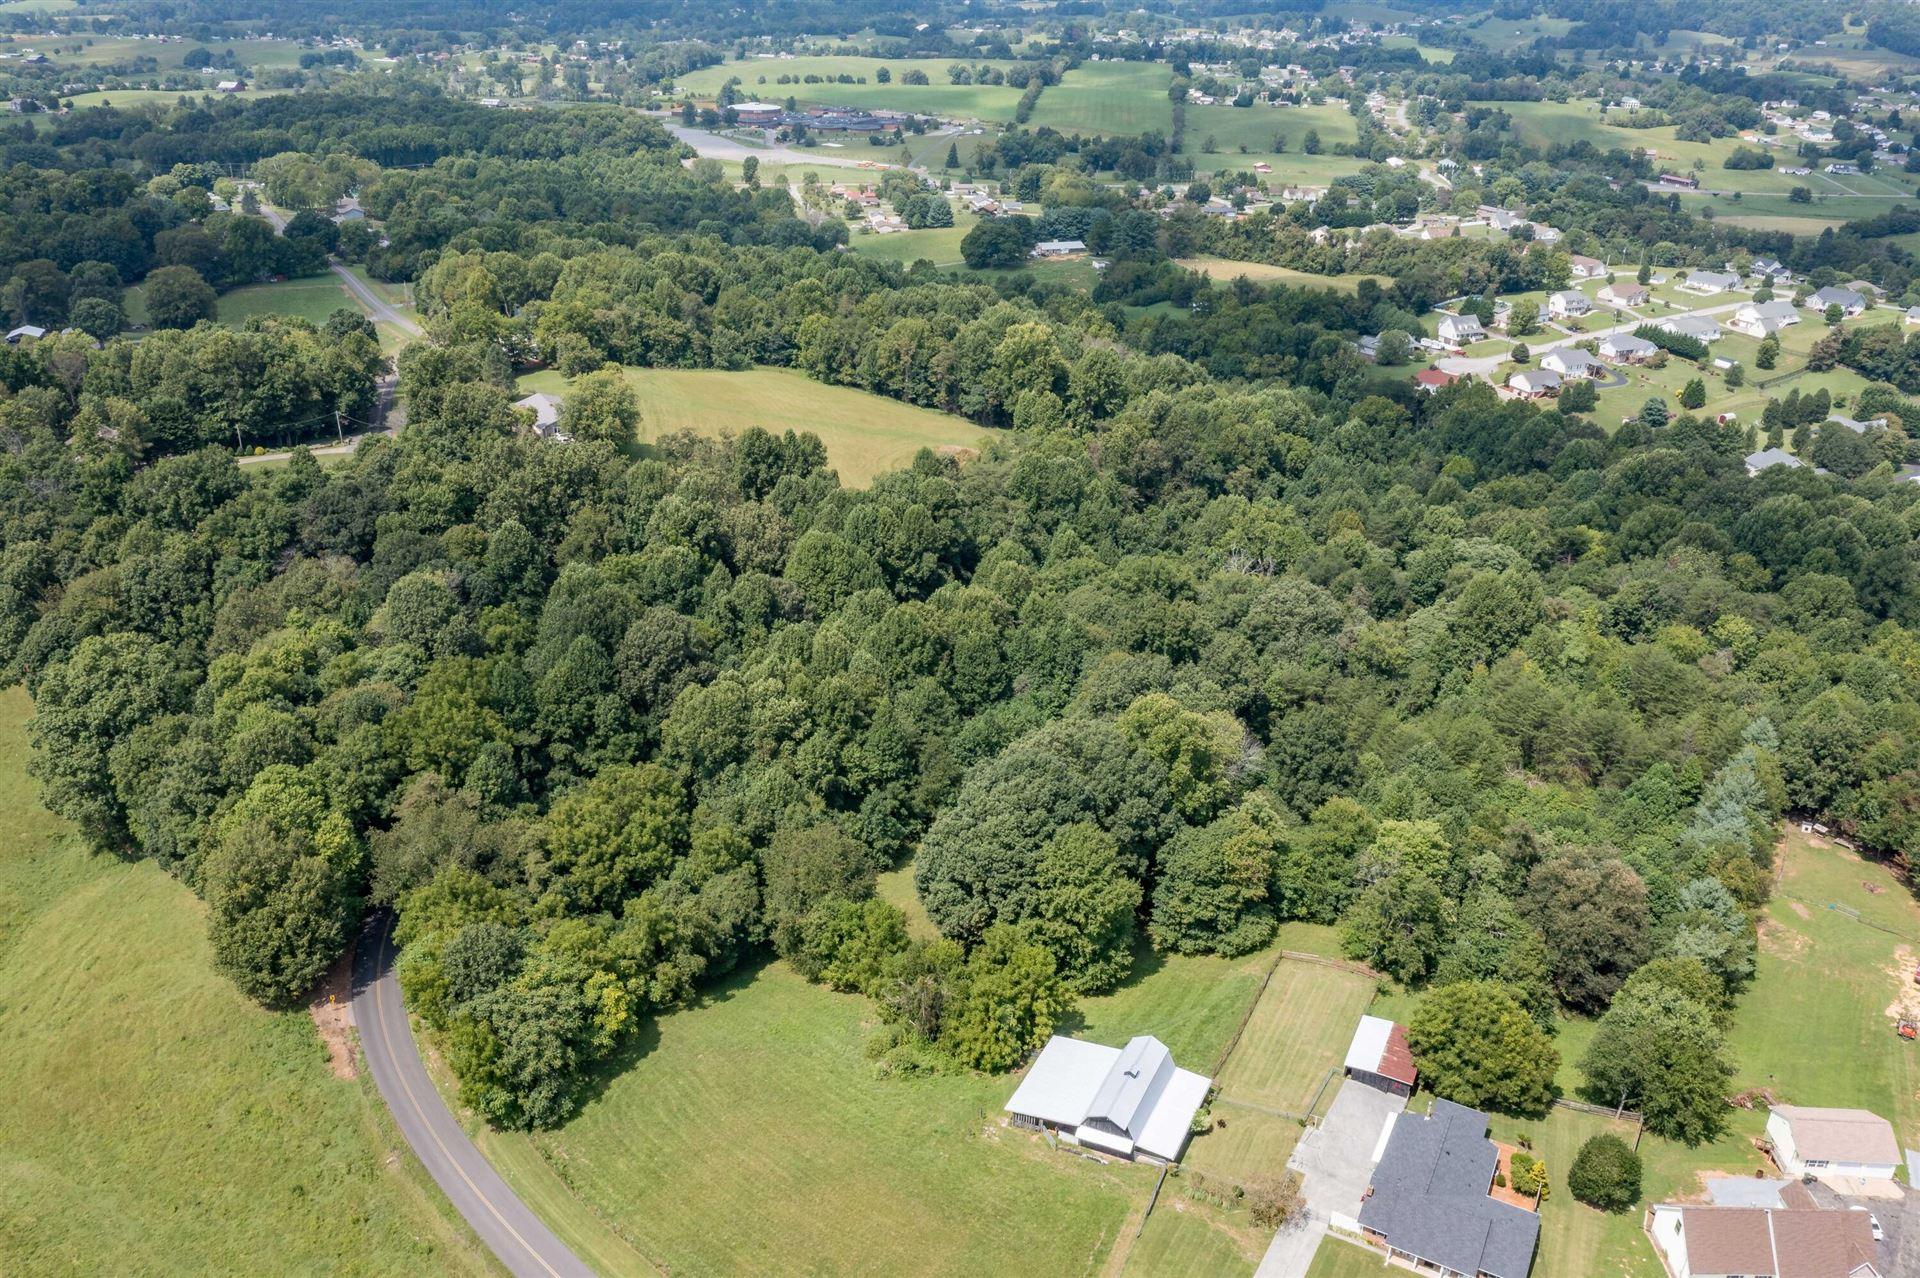 Photo of 0 Roy Phillips Road, Jonesborough, TN 37659 (MLS # 9928200)